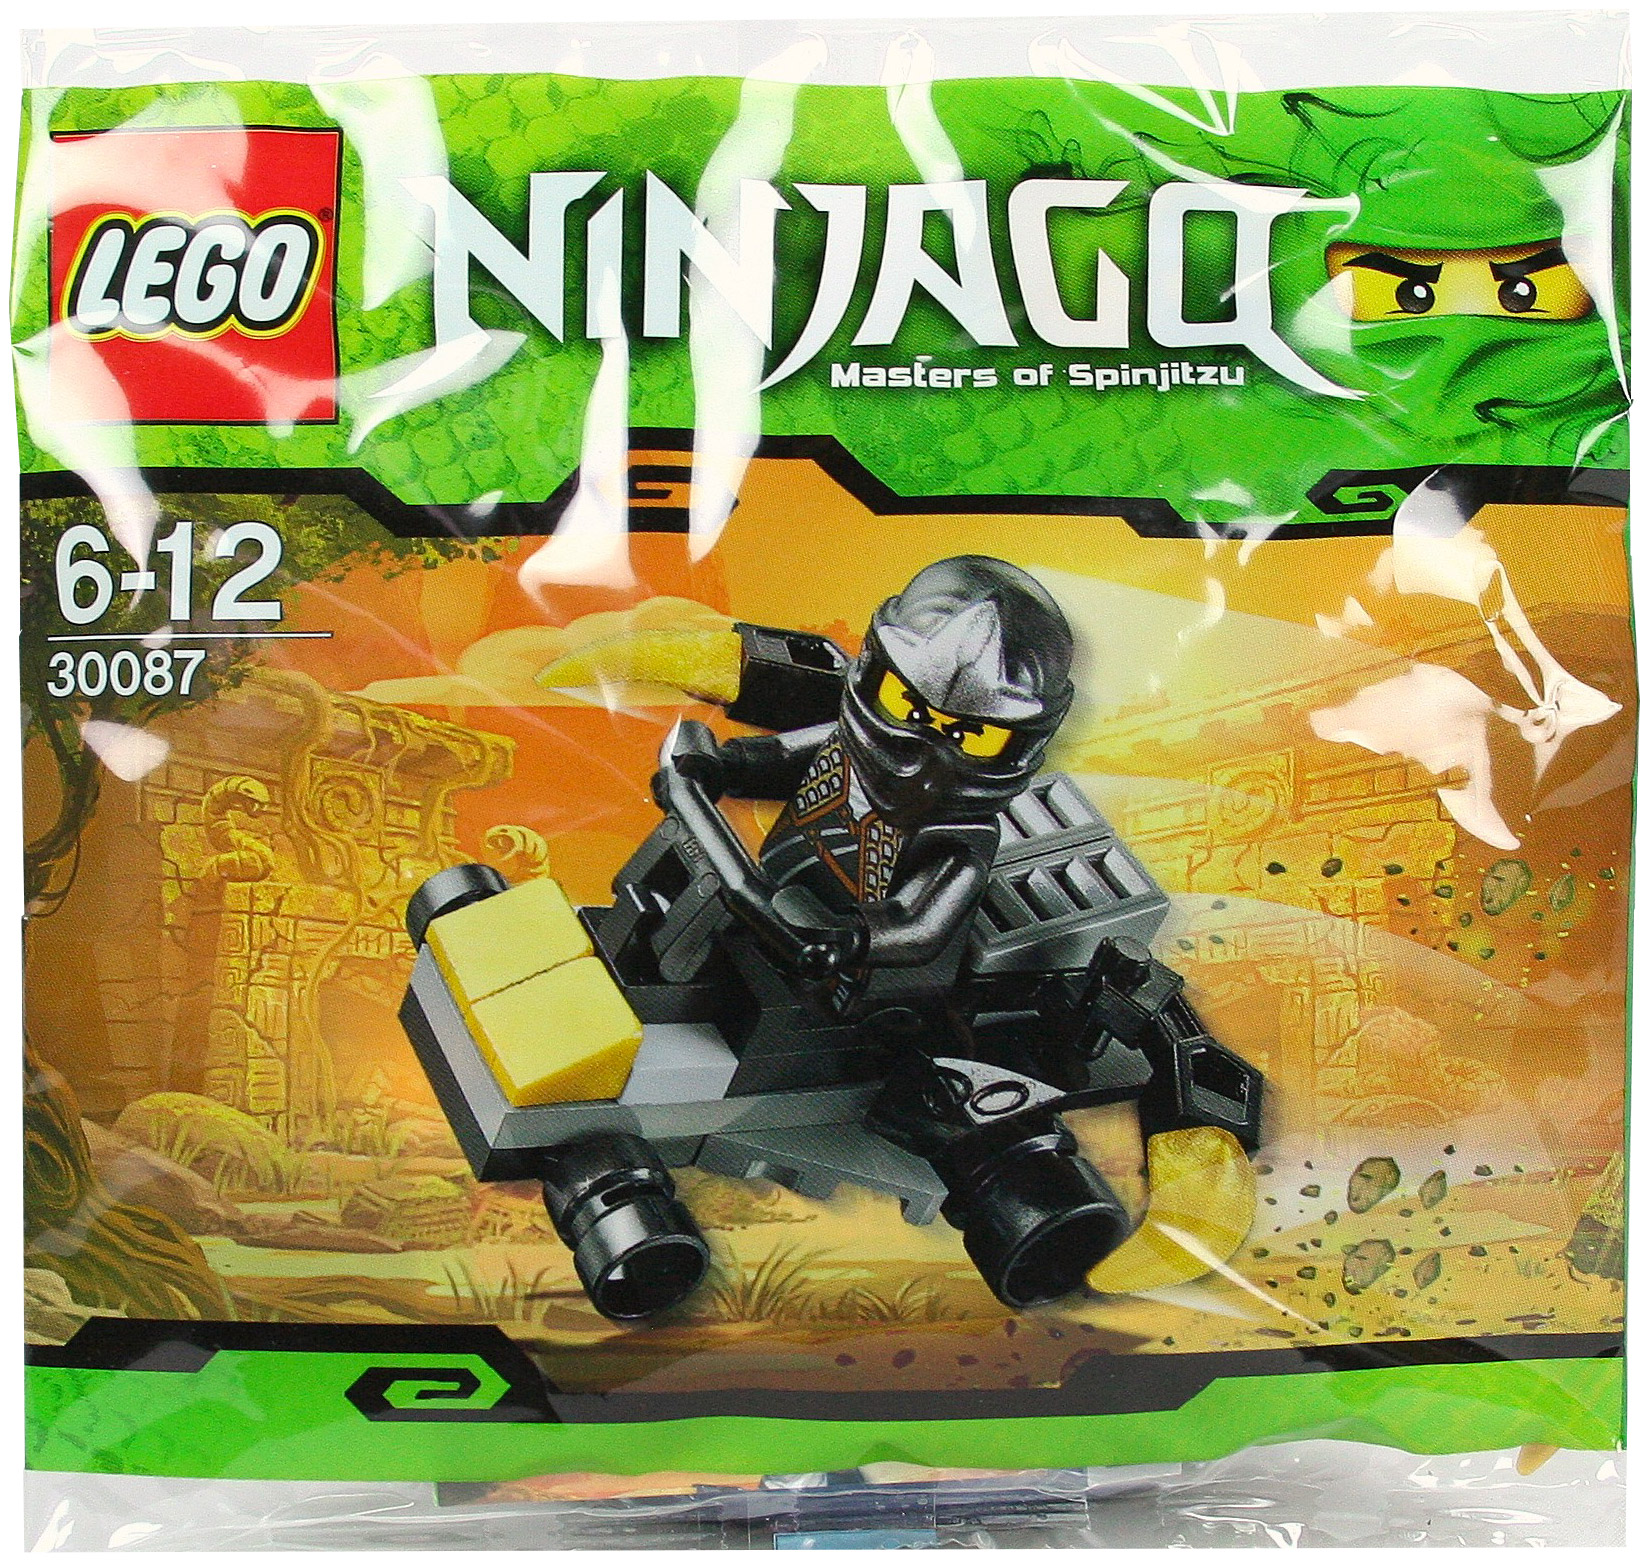 lego ninjago 30087 pas cher cole zx car polybag. Black Bedroom Furniture Sets. Home Design Ideas